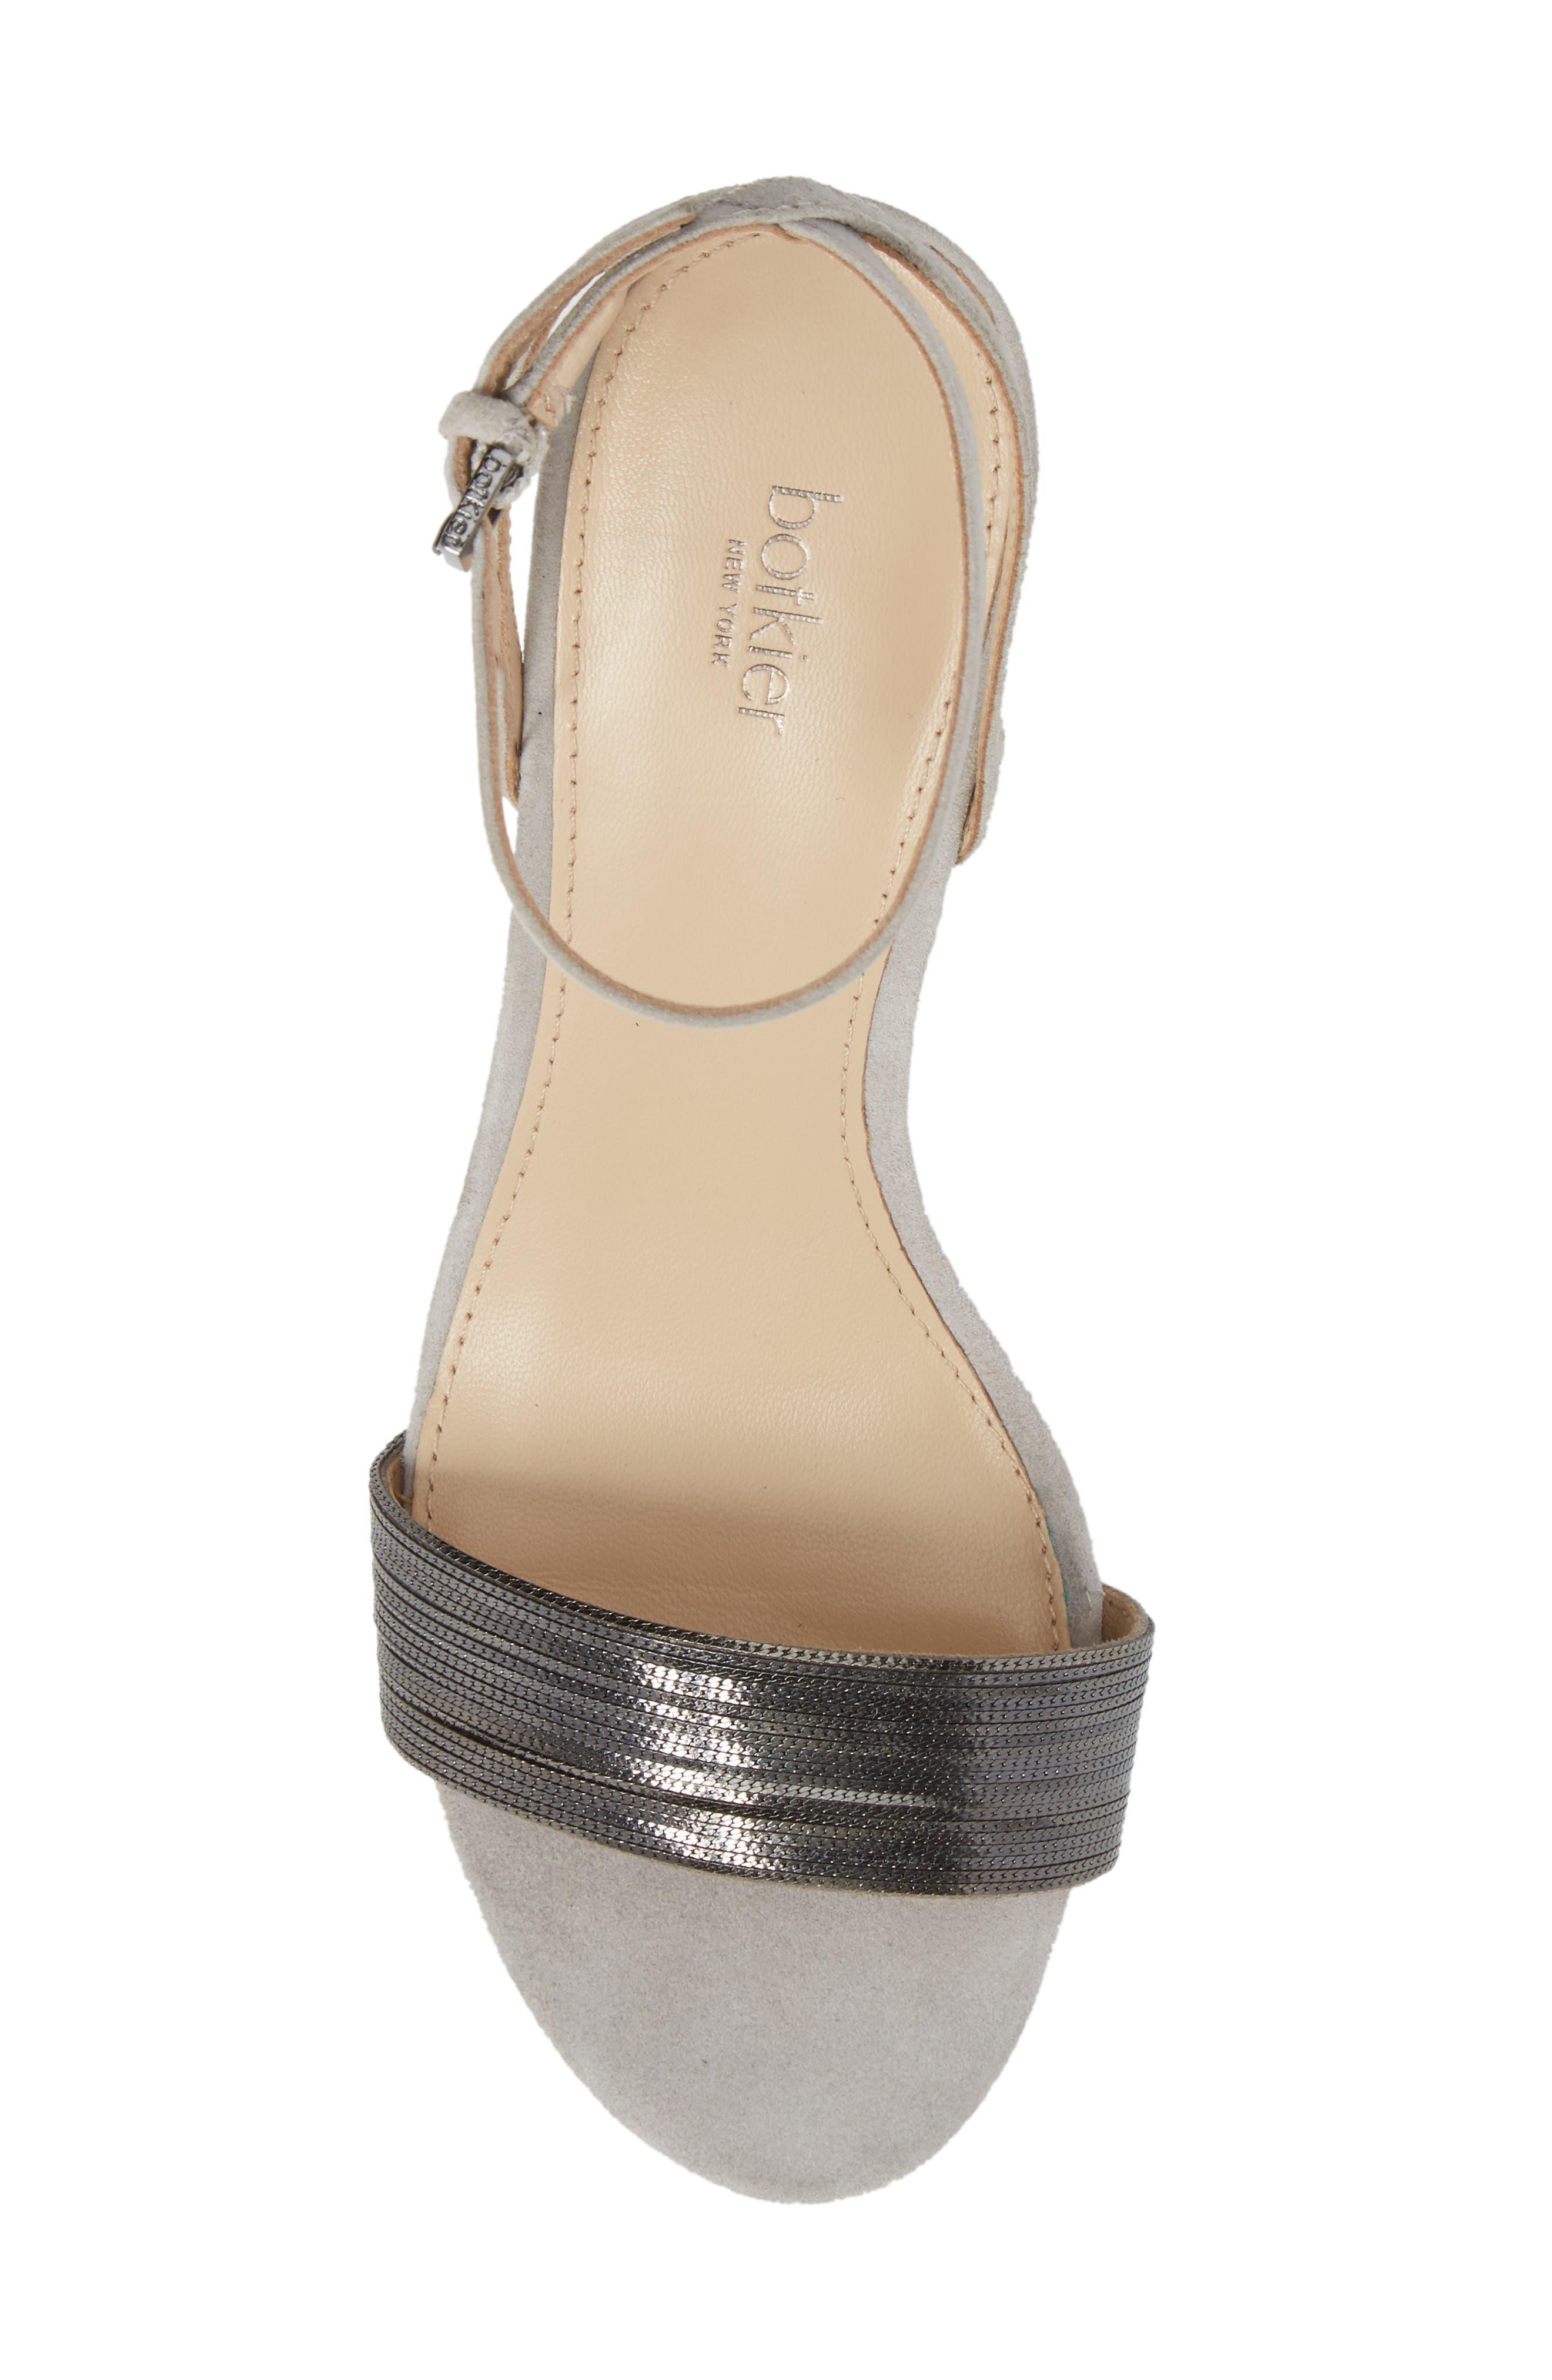 Persi Chain Wraparound Sandal,                             Alternate thumbnail 5, color,                             040